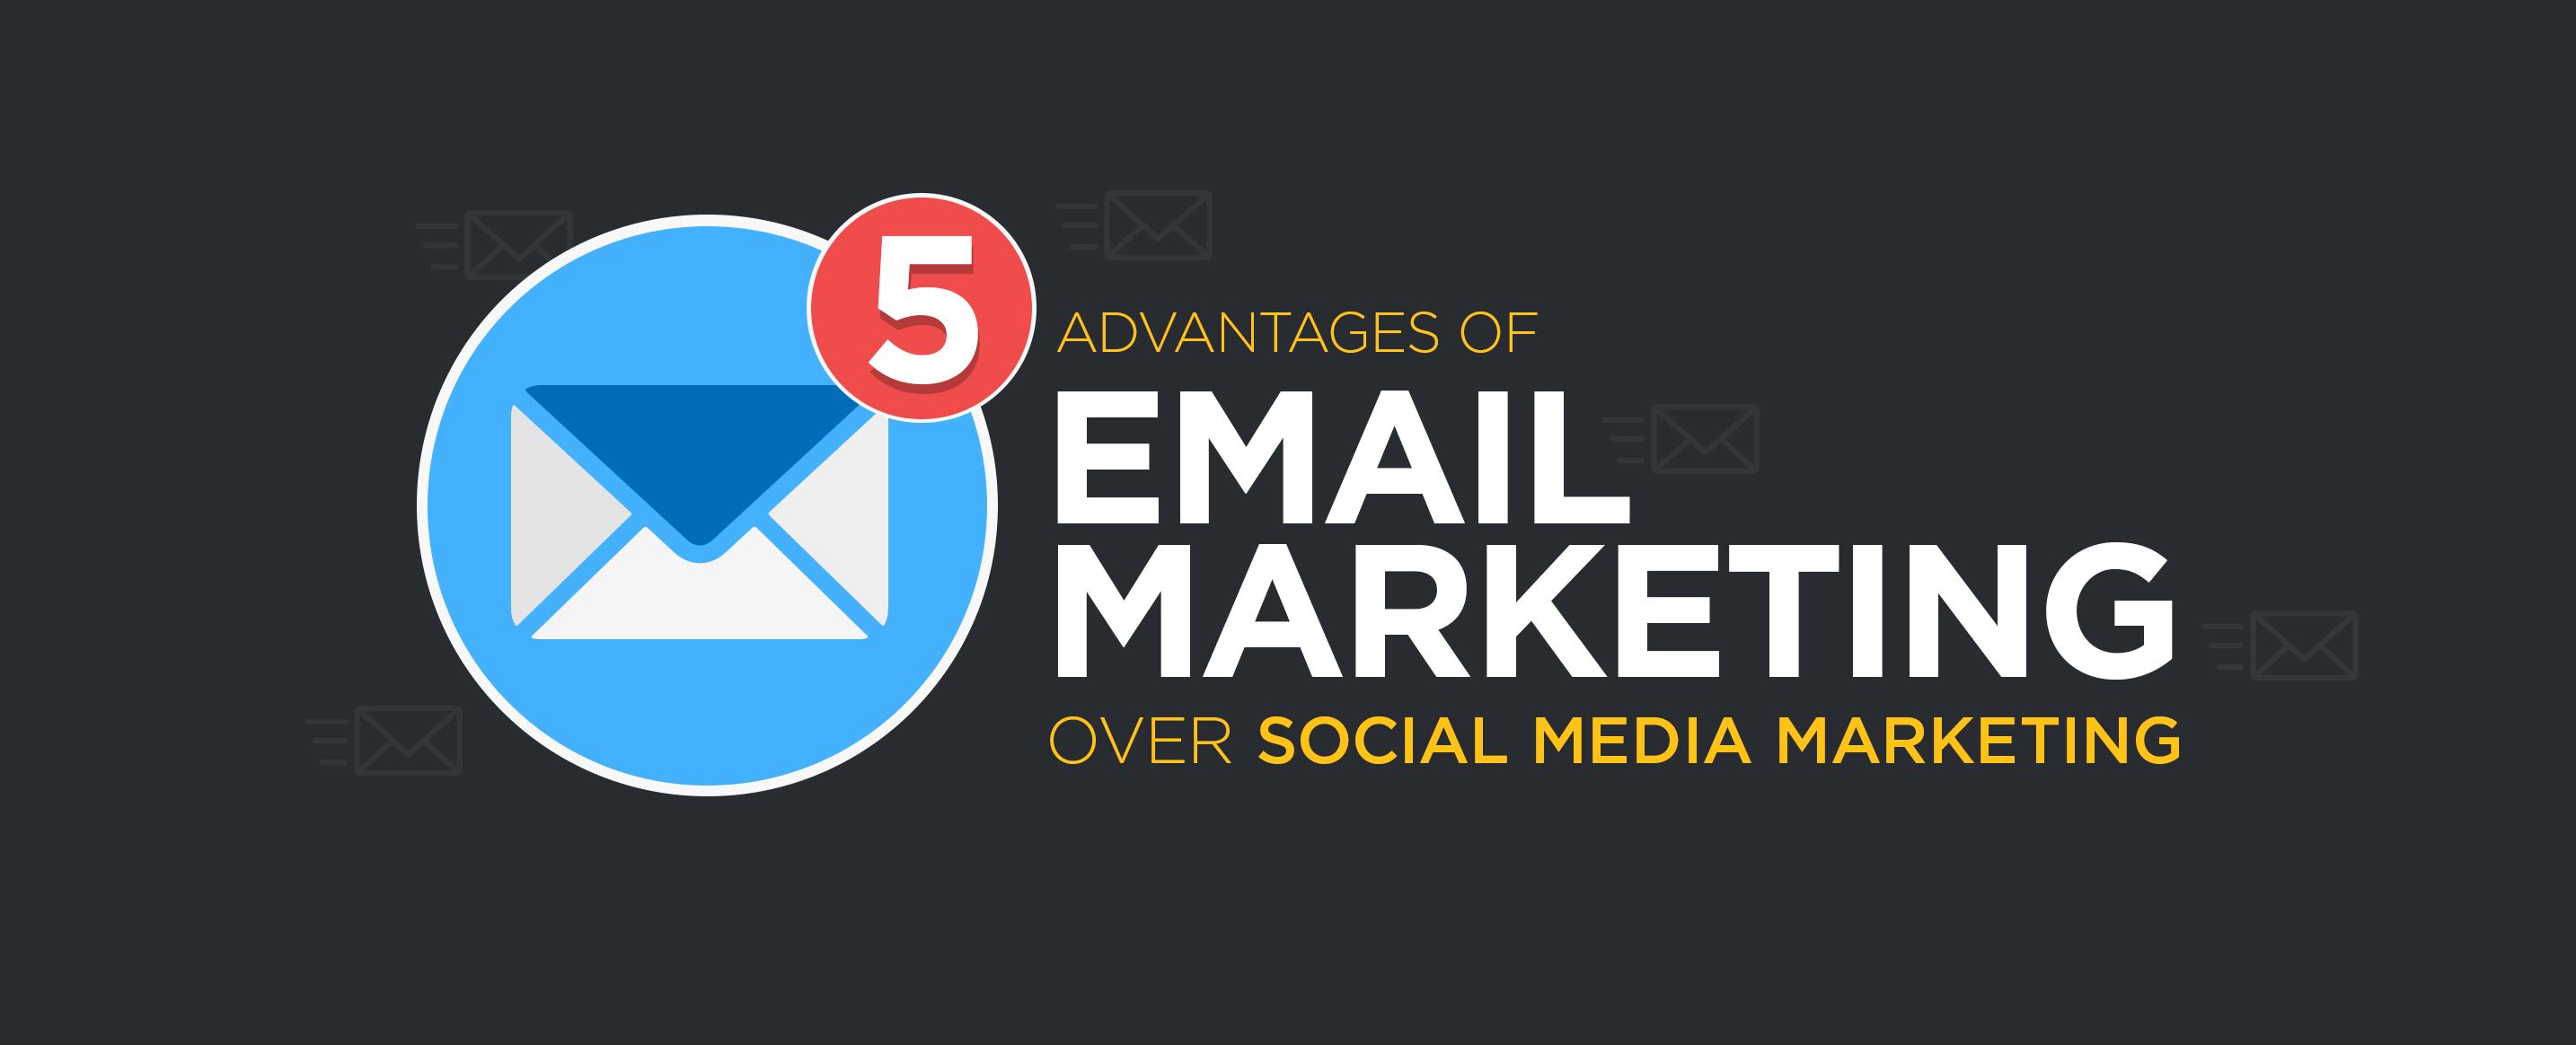 Advantages-Of-Email-Marketing-Over-Social-Media-Marketing